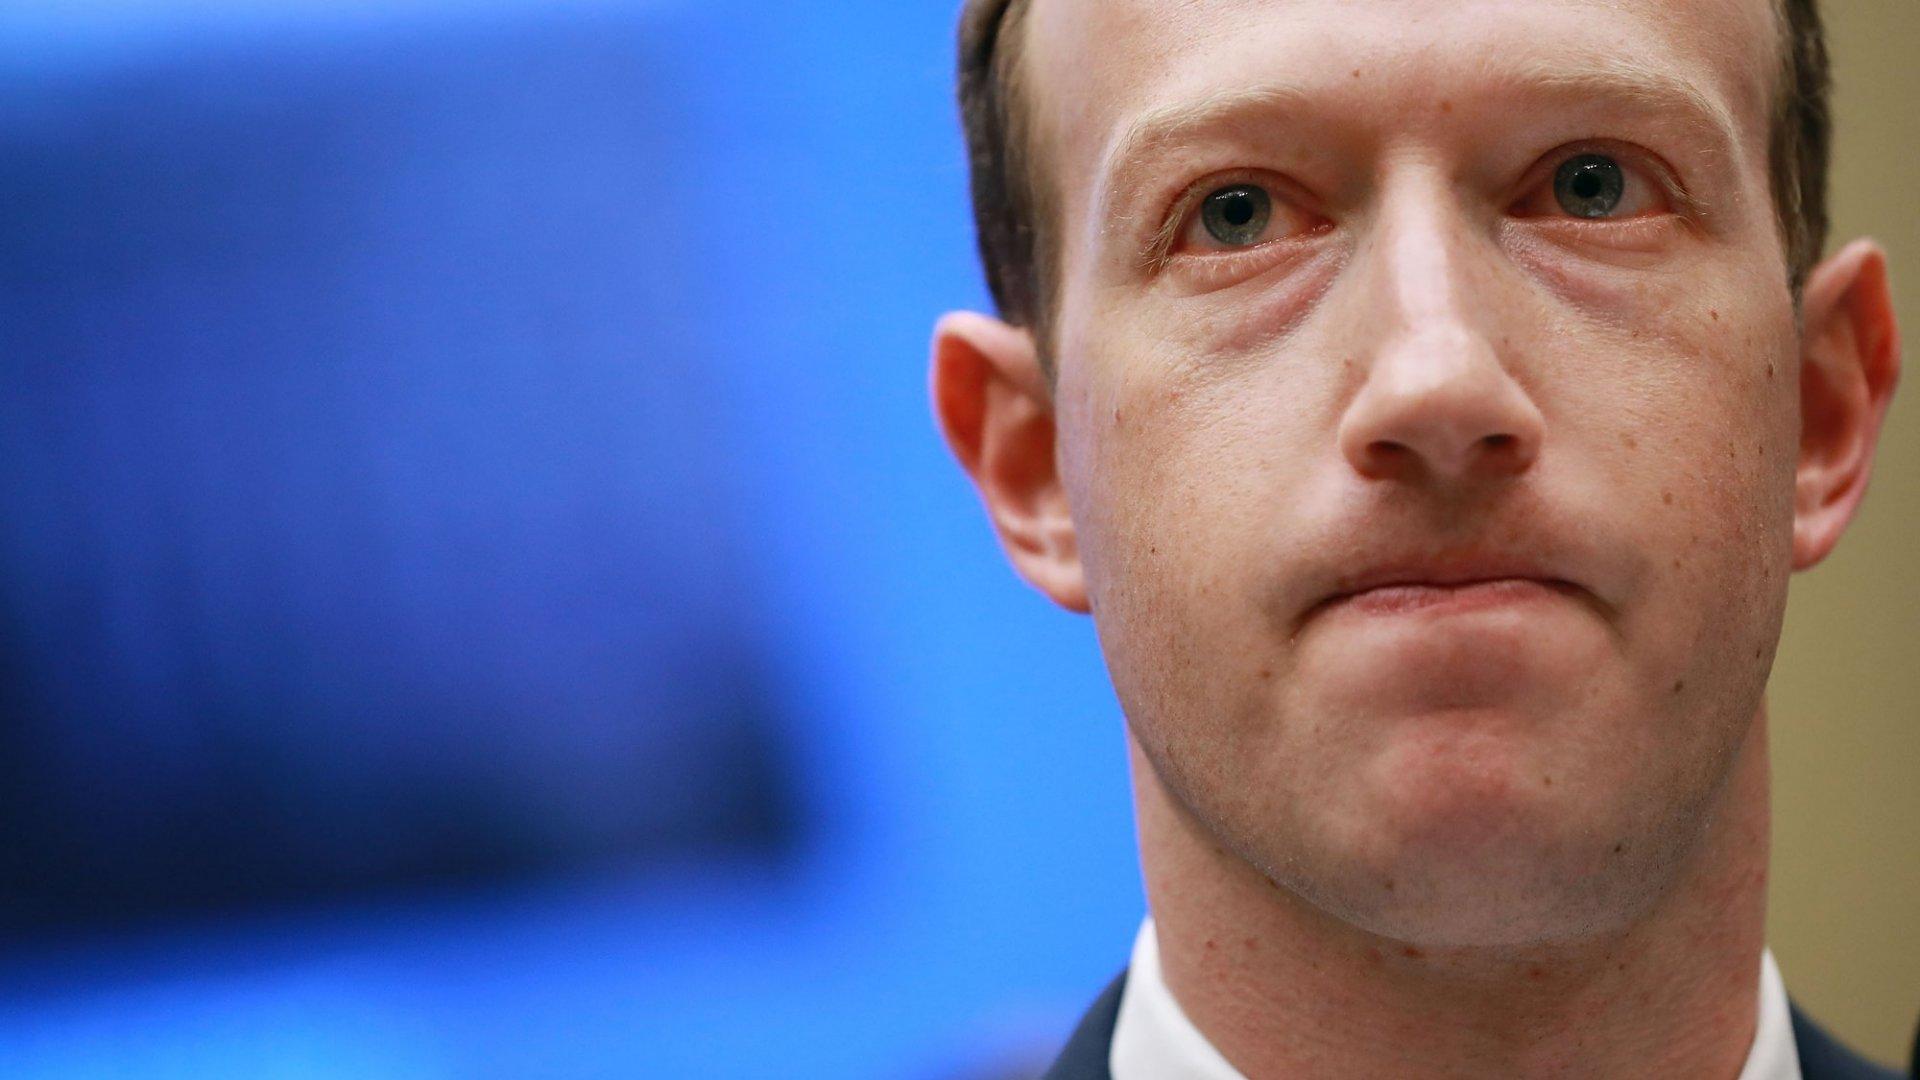 Teens Prefer Snapchat and YouTubeto Facebook,But Mark Zuckerberg's Social Media Juggernaut Has 1 Huge Edge